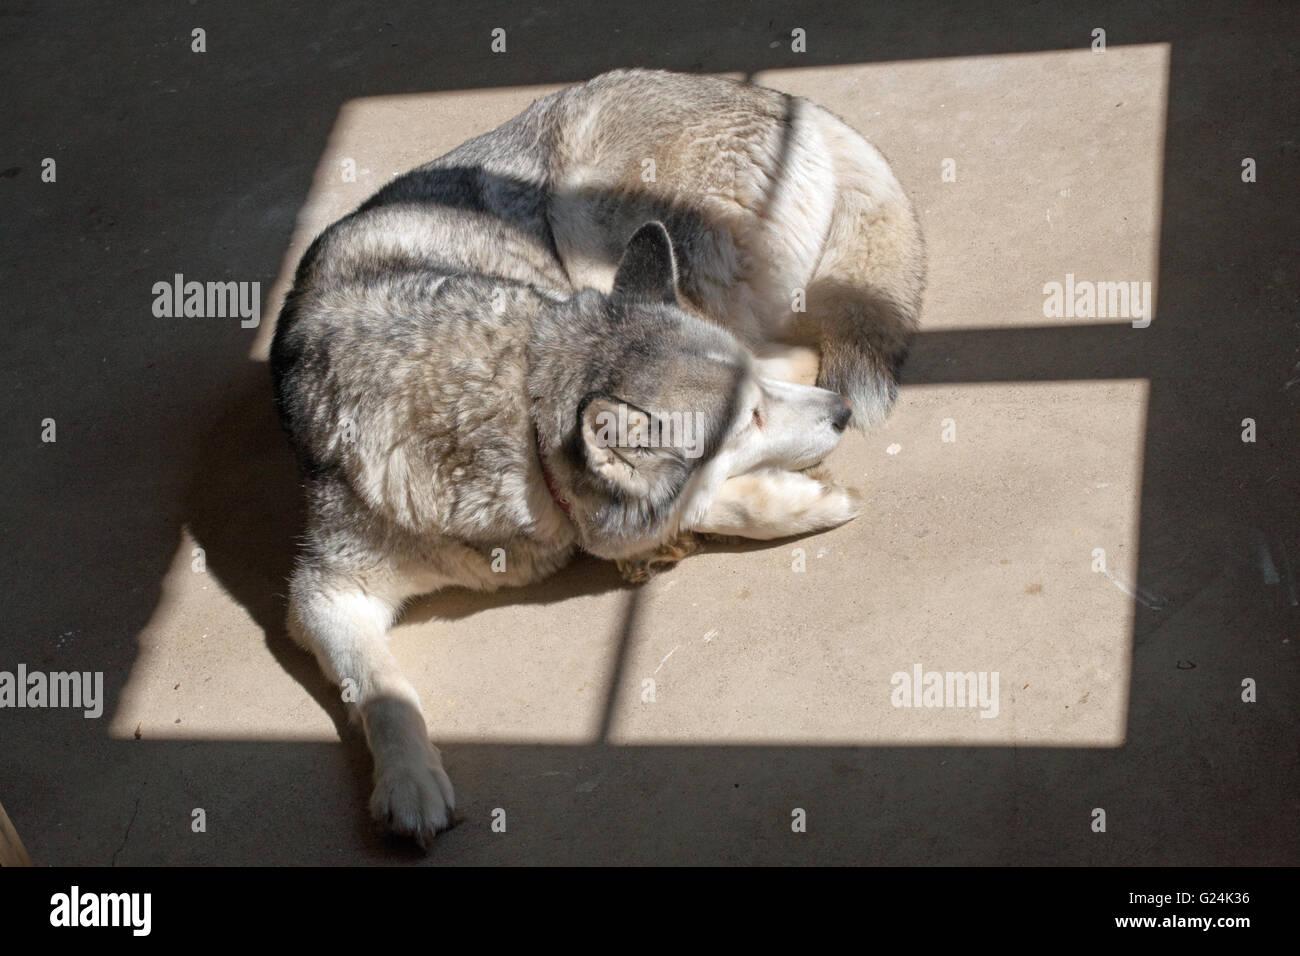 Dog, a Siberian Husky (Canis lupus familiaris), seeking warmth of sunlight shining through a window frame onto a - Stock Image